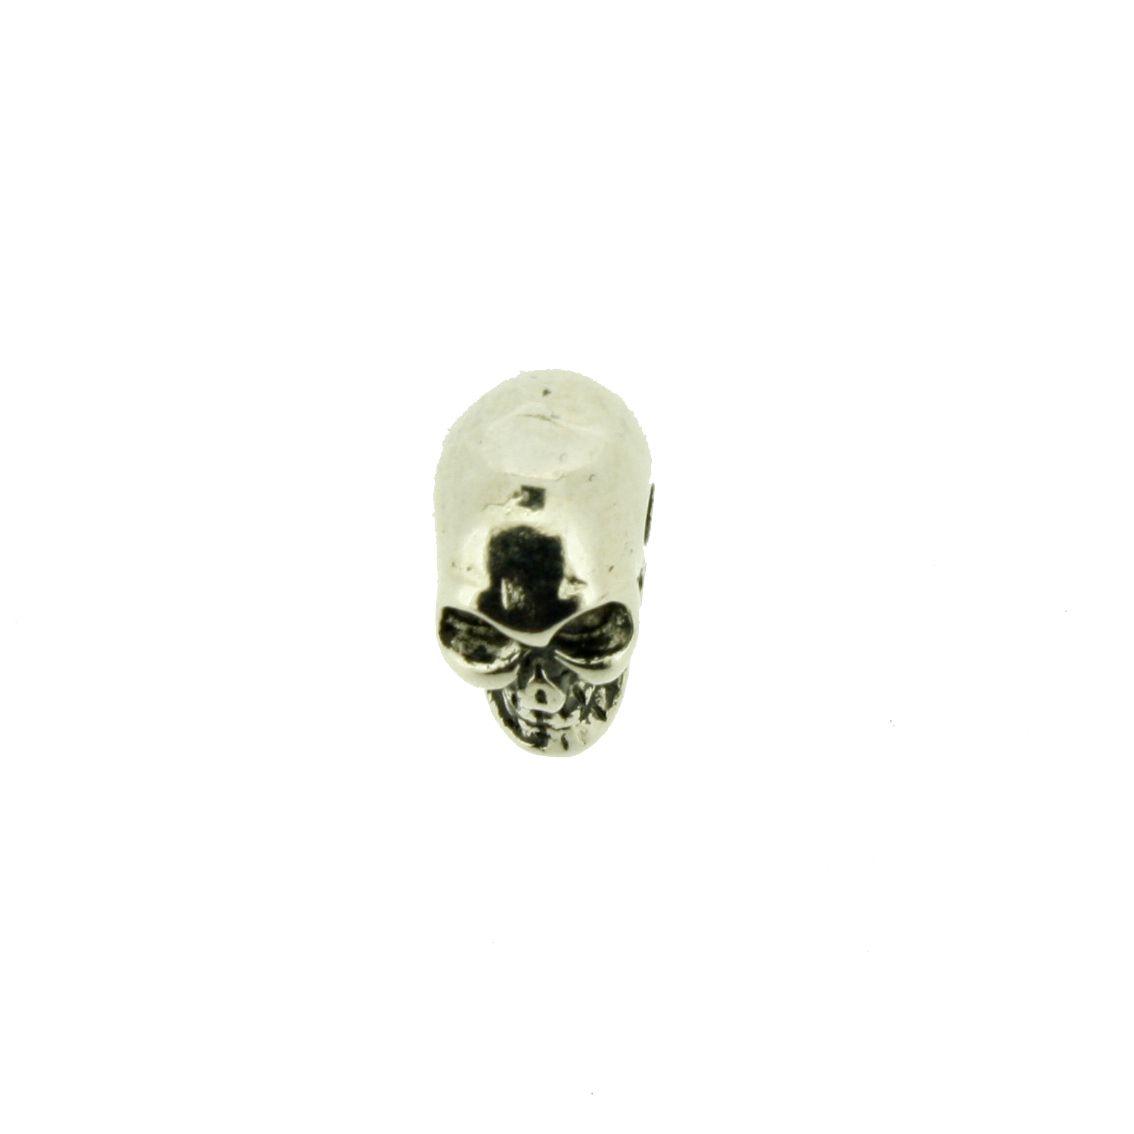 Caveira - Níquel - 13mm - 01 Peça  - Stéphanie Bijoux® - Peças para Bijuterias e Artesanato